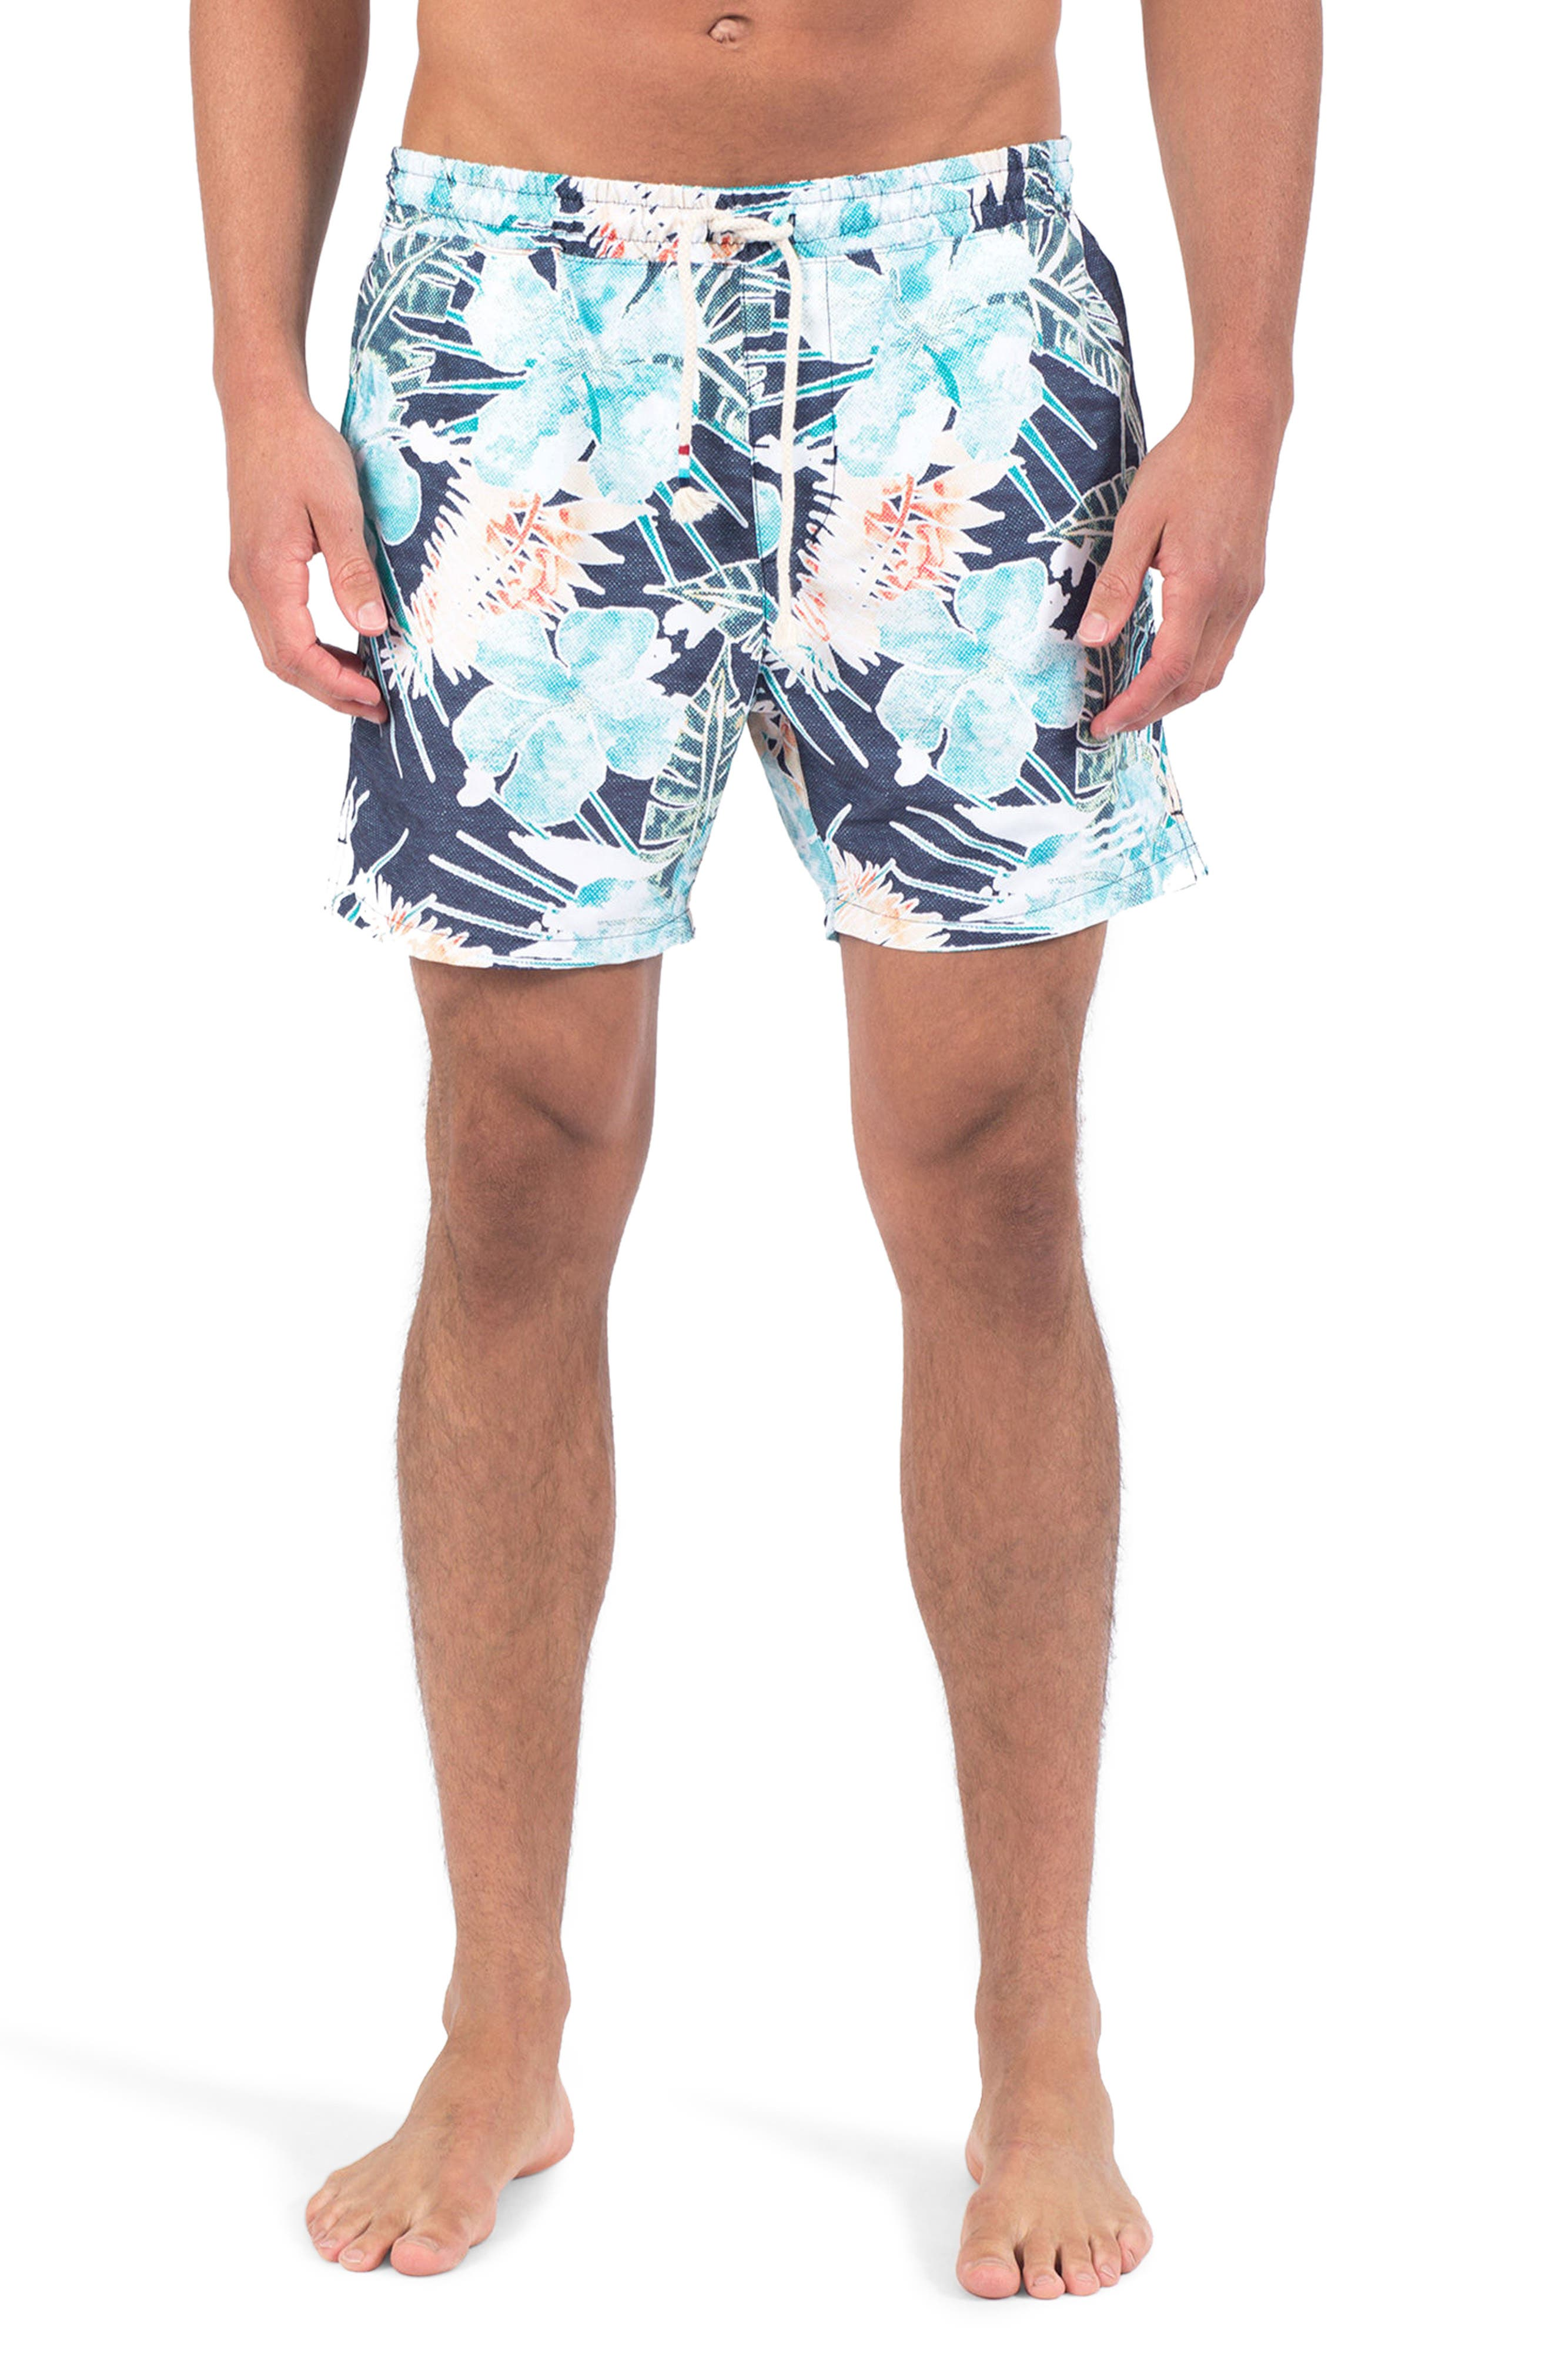 Botanica Verde Swim Shorts,                             Main thumbnail 1, color,                             Botanica Verde